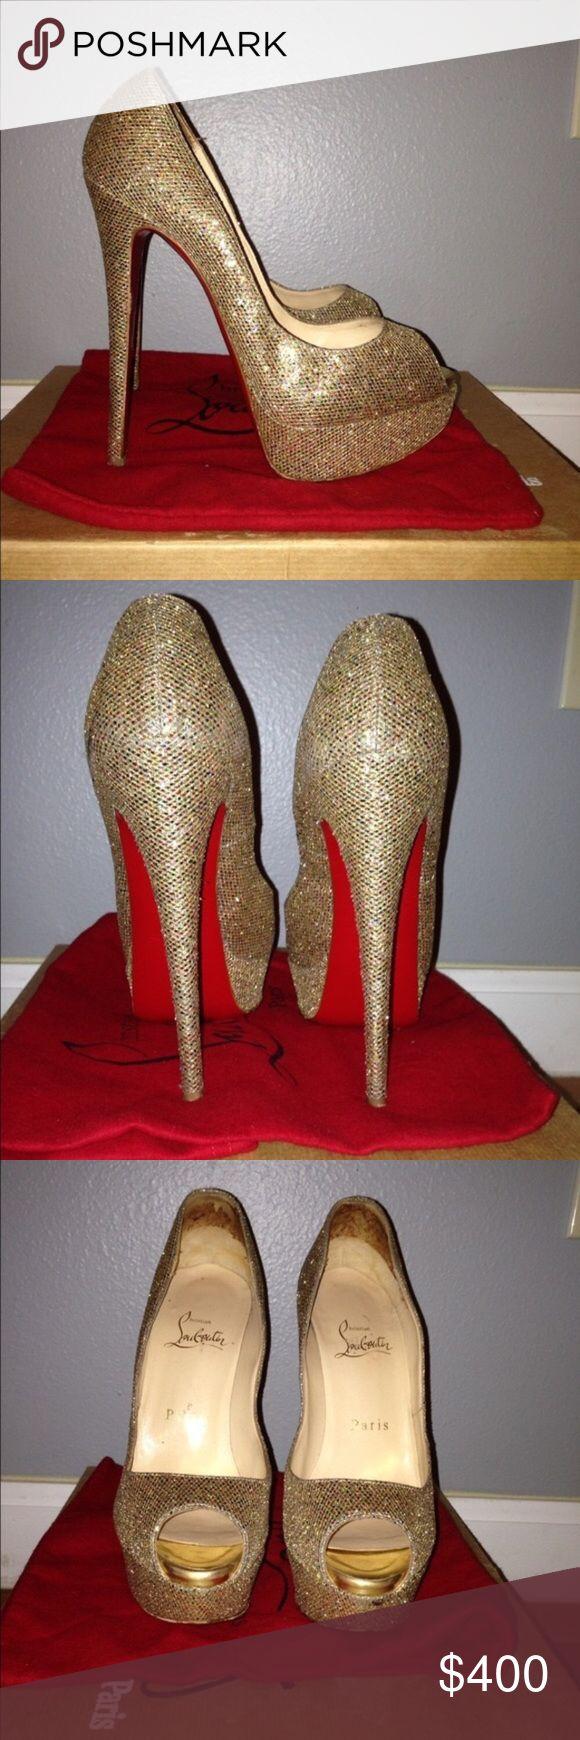 GORGEOUS GOLD CHRISTIAN LOUBOUTIN PUMPS SZ 6.5 GORGEOUS GOLD CHRISTIAN LOUBOUTIN PUMPS SZ 37 (but fits like a 6.5) 100% Authentic! Comes with dust bag Christian Louboutin Shoes Platforms